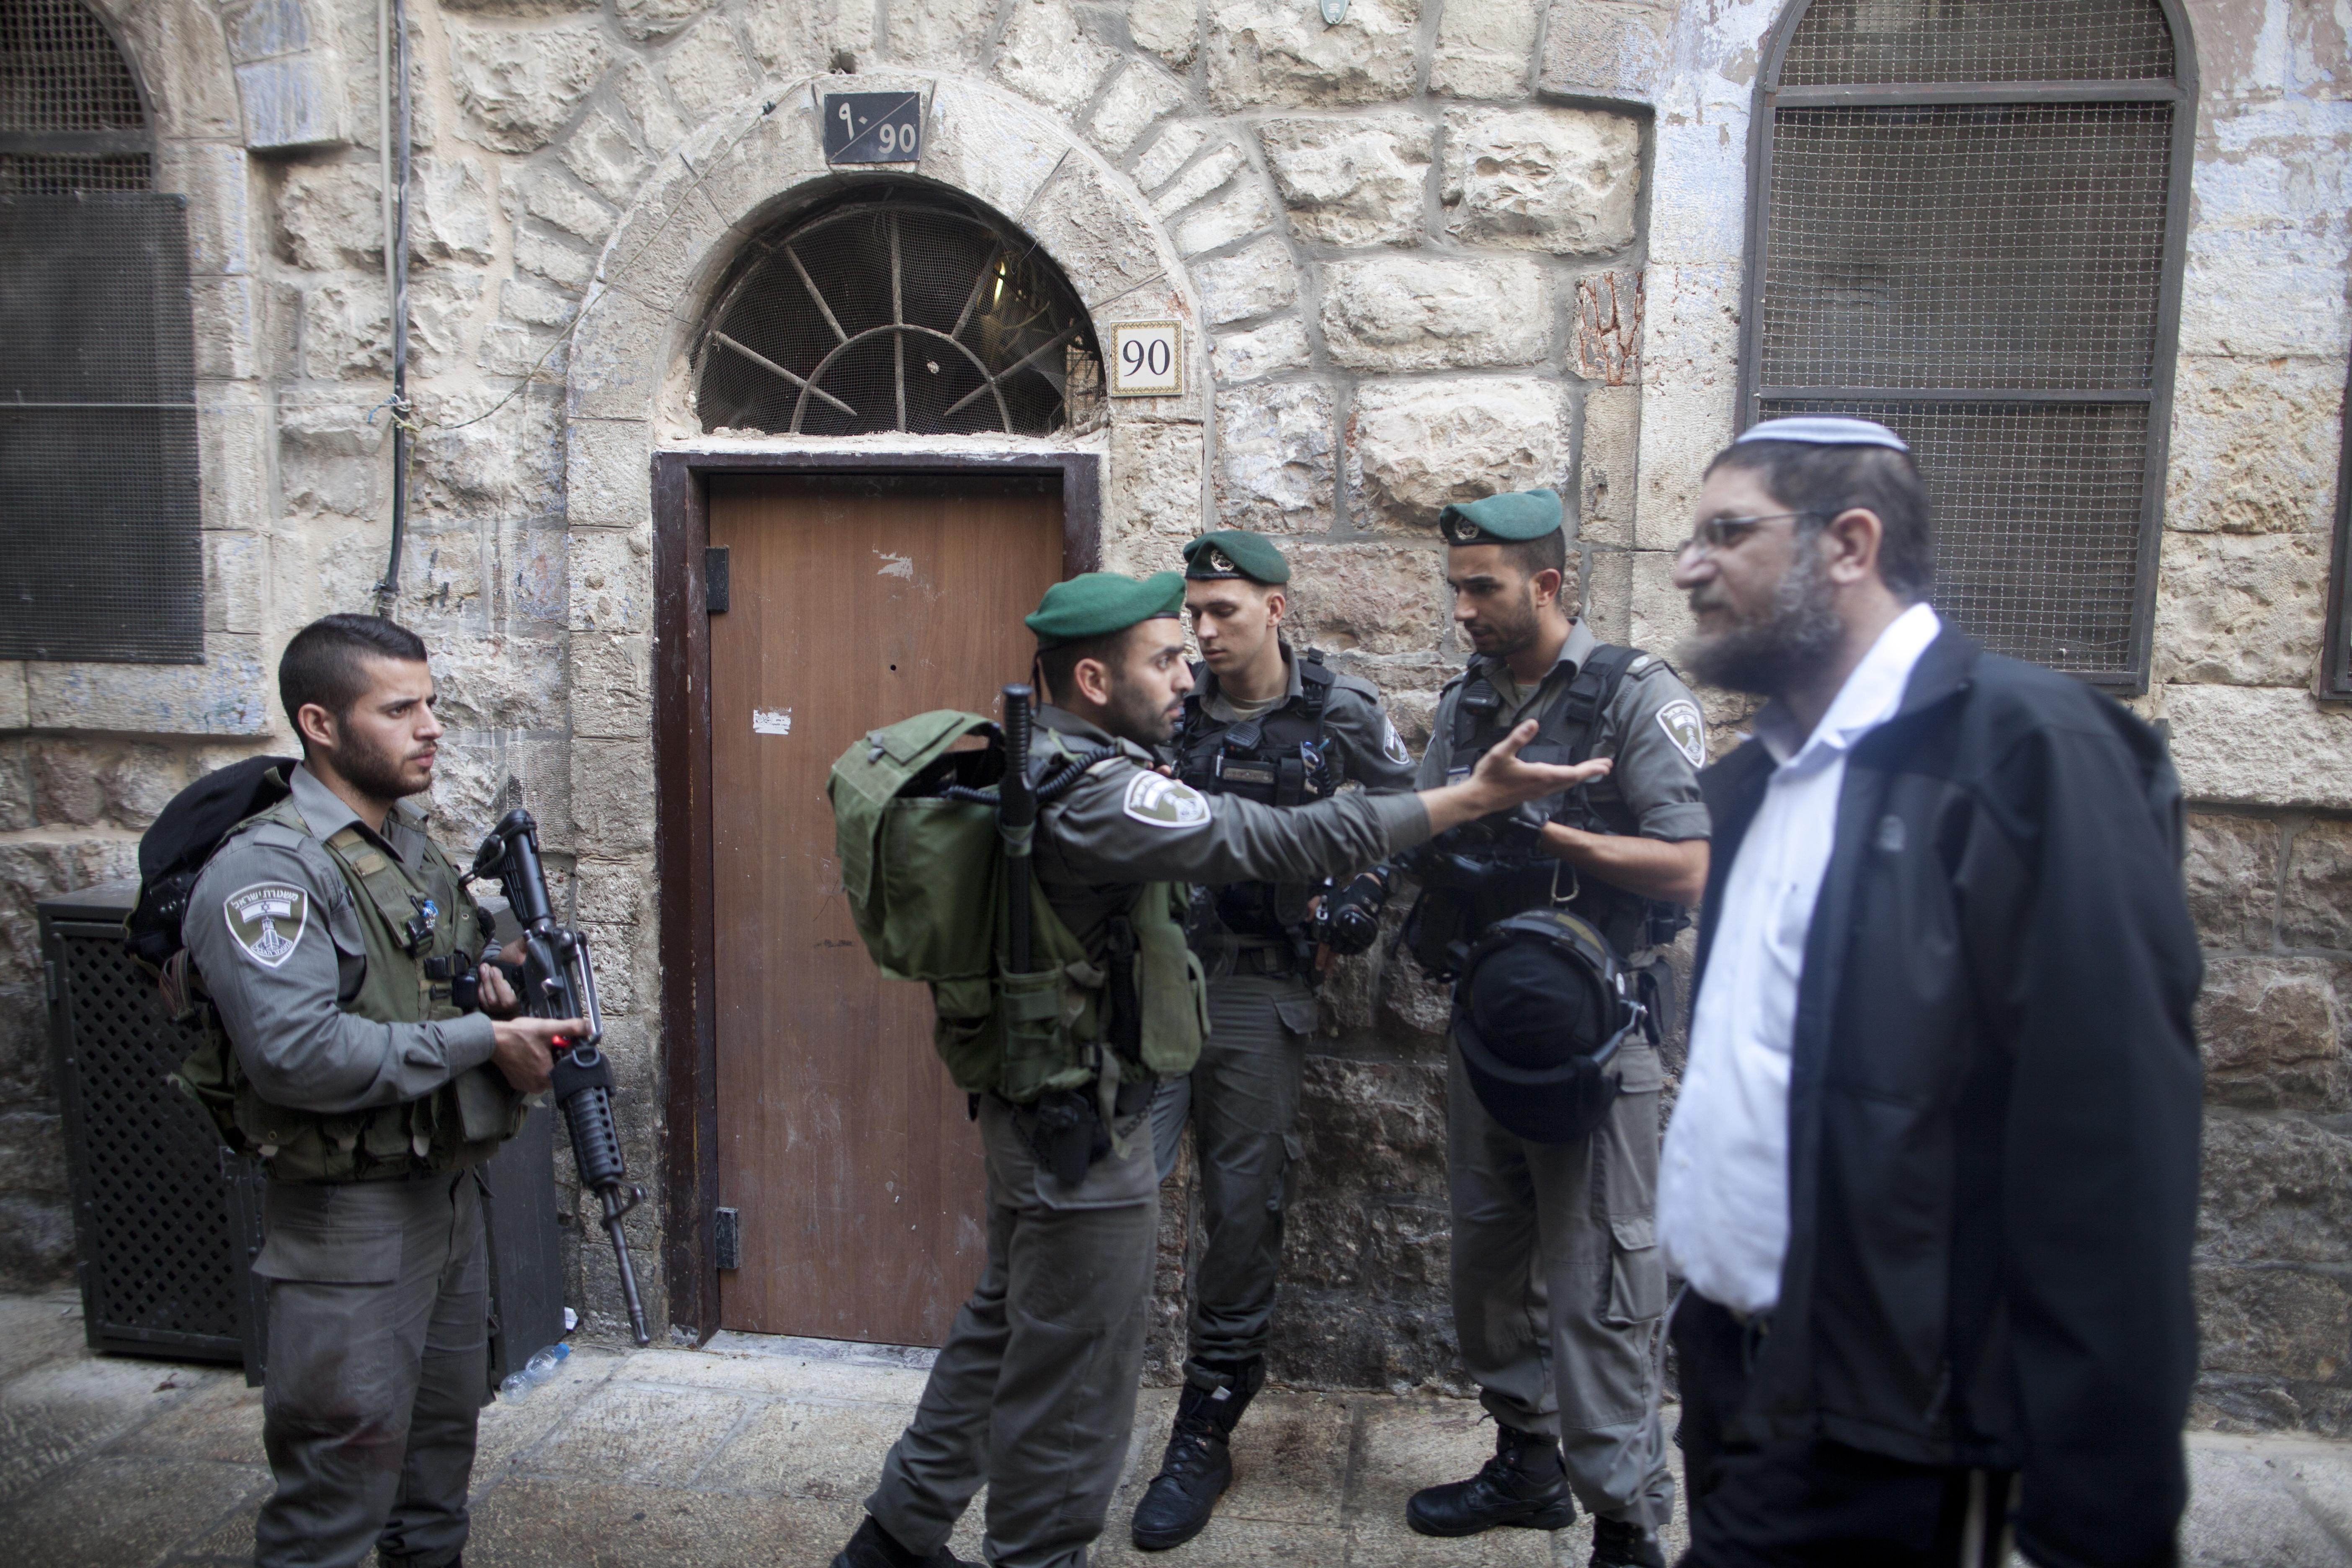 jerusalem 7 october 2015